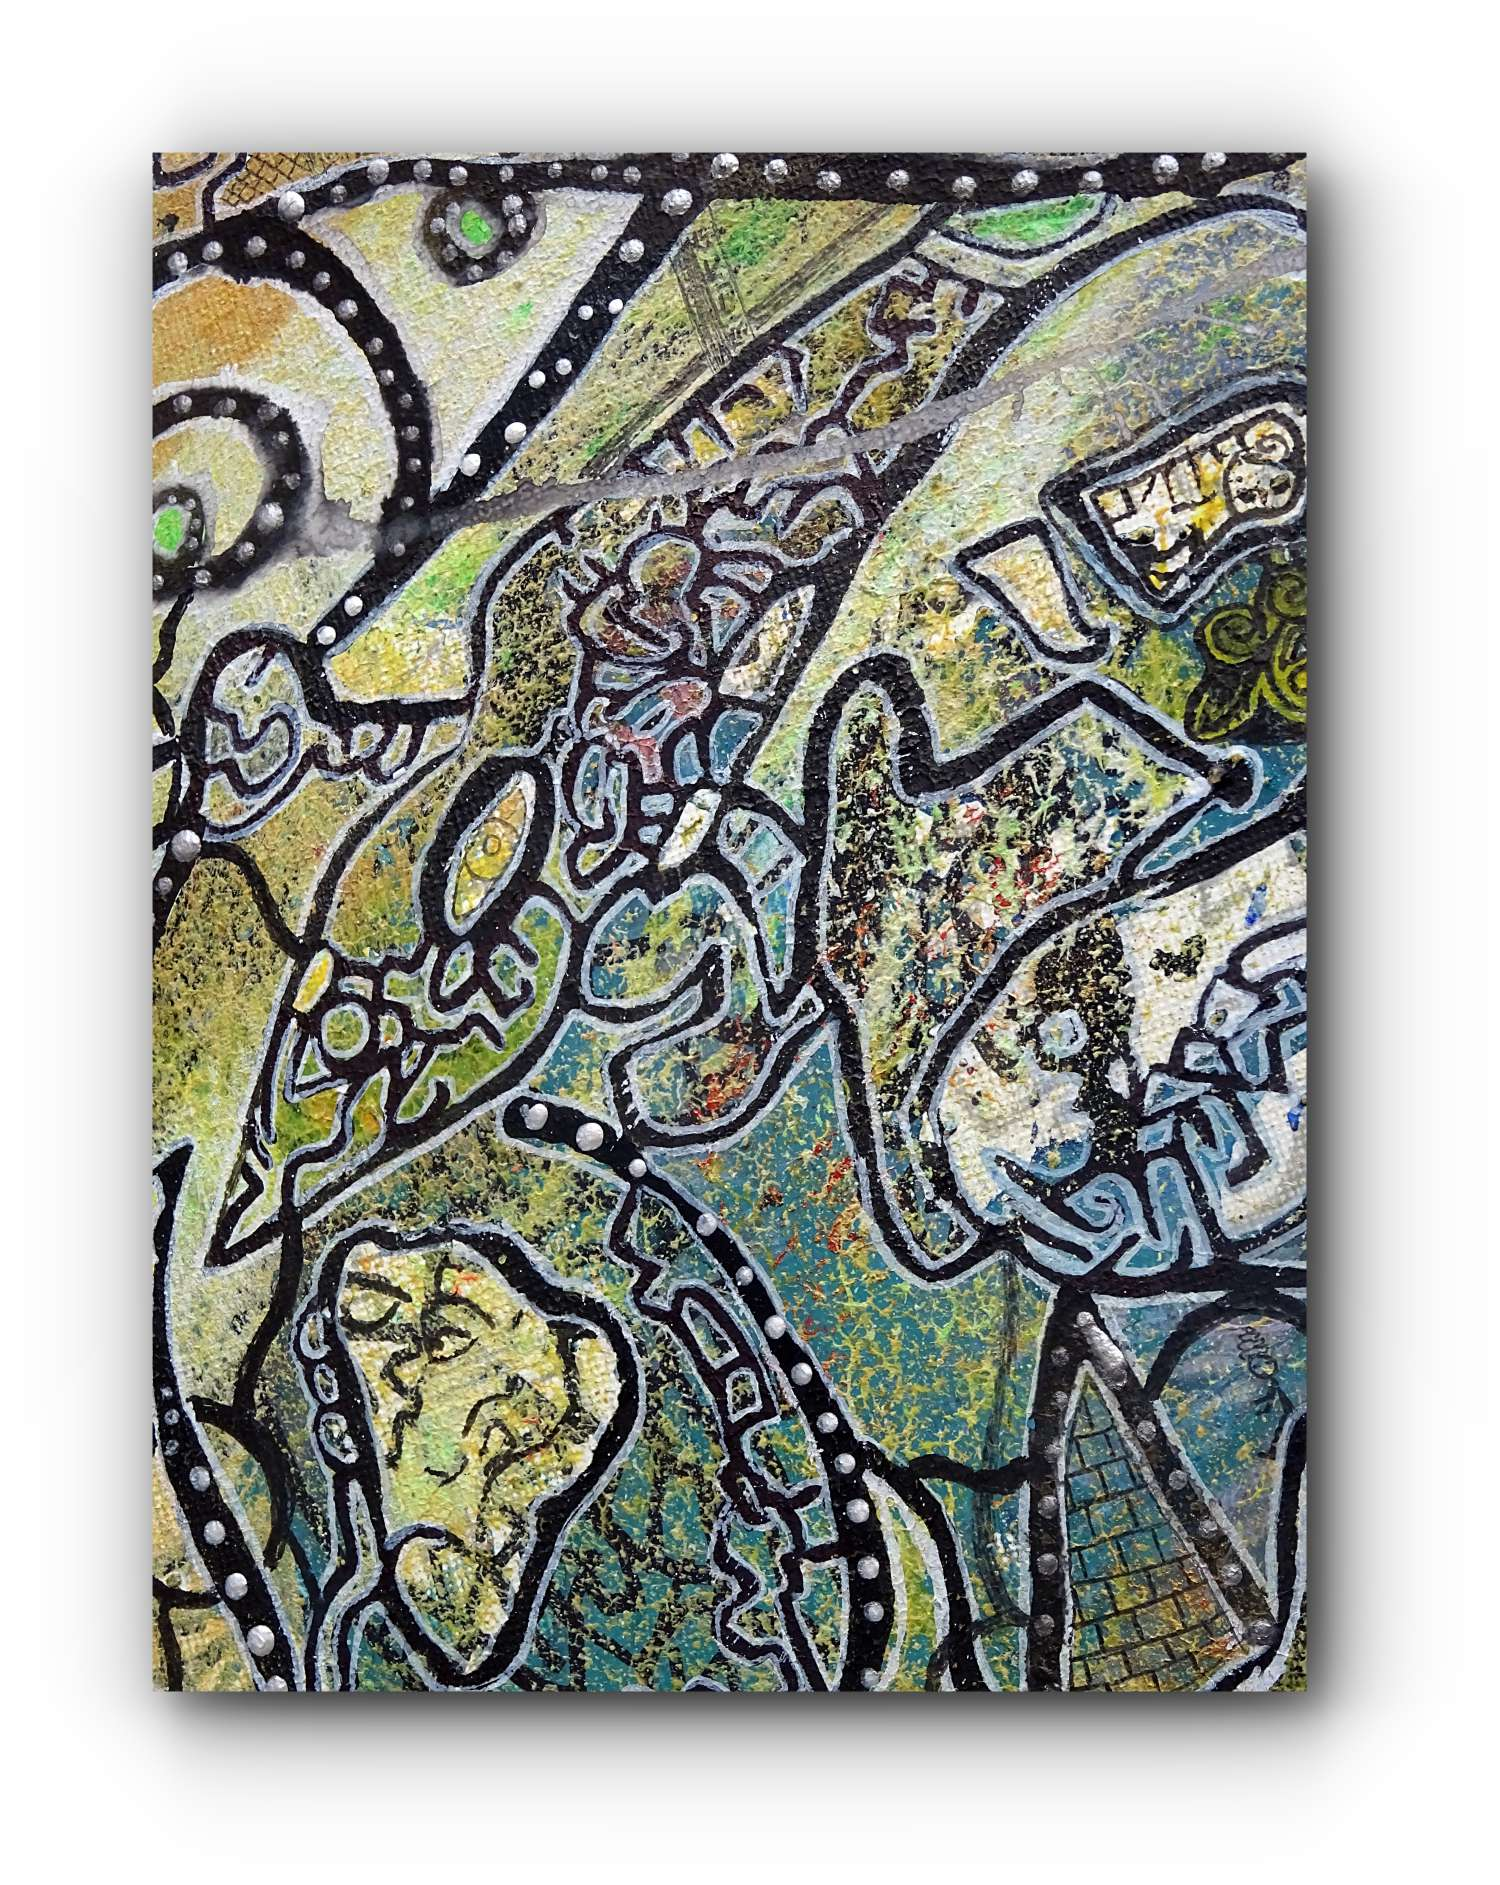 painting-detail-15-desert-dwellers-artists-ingress-vortices.jpg